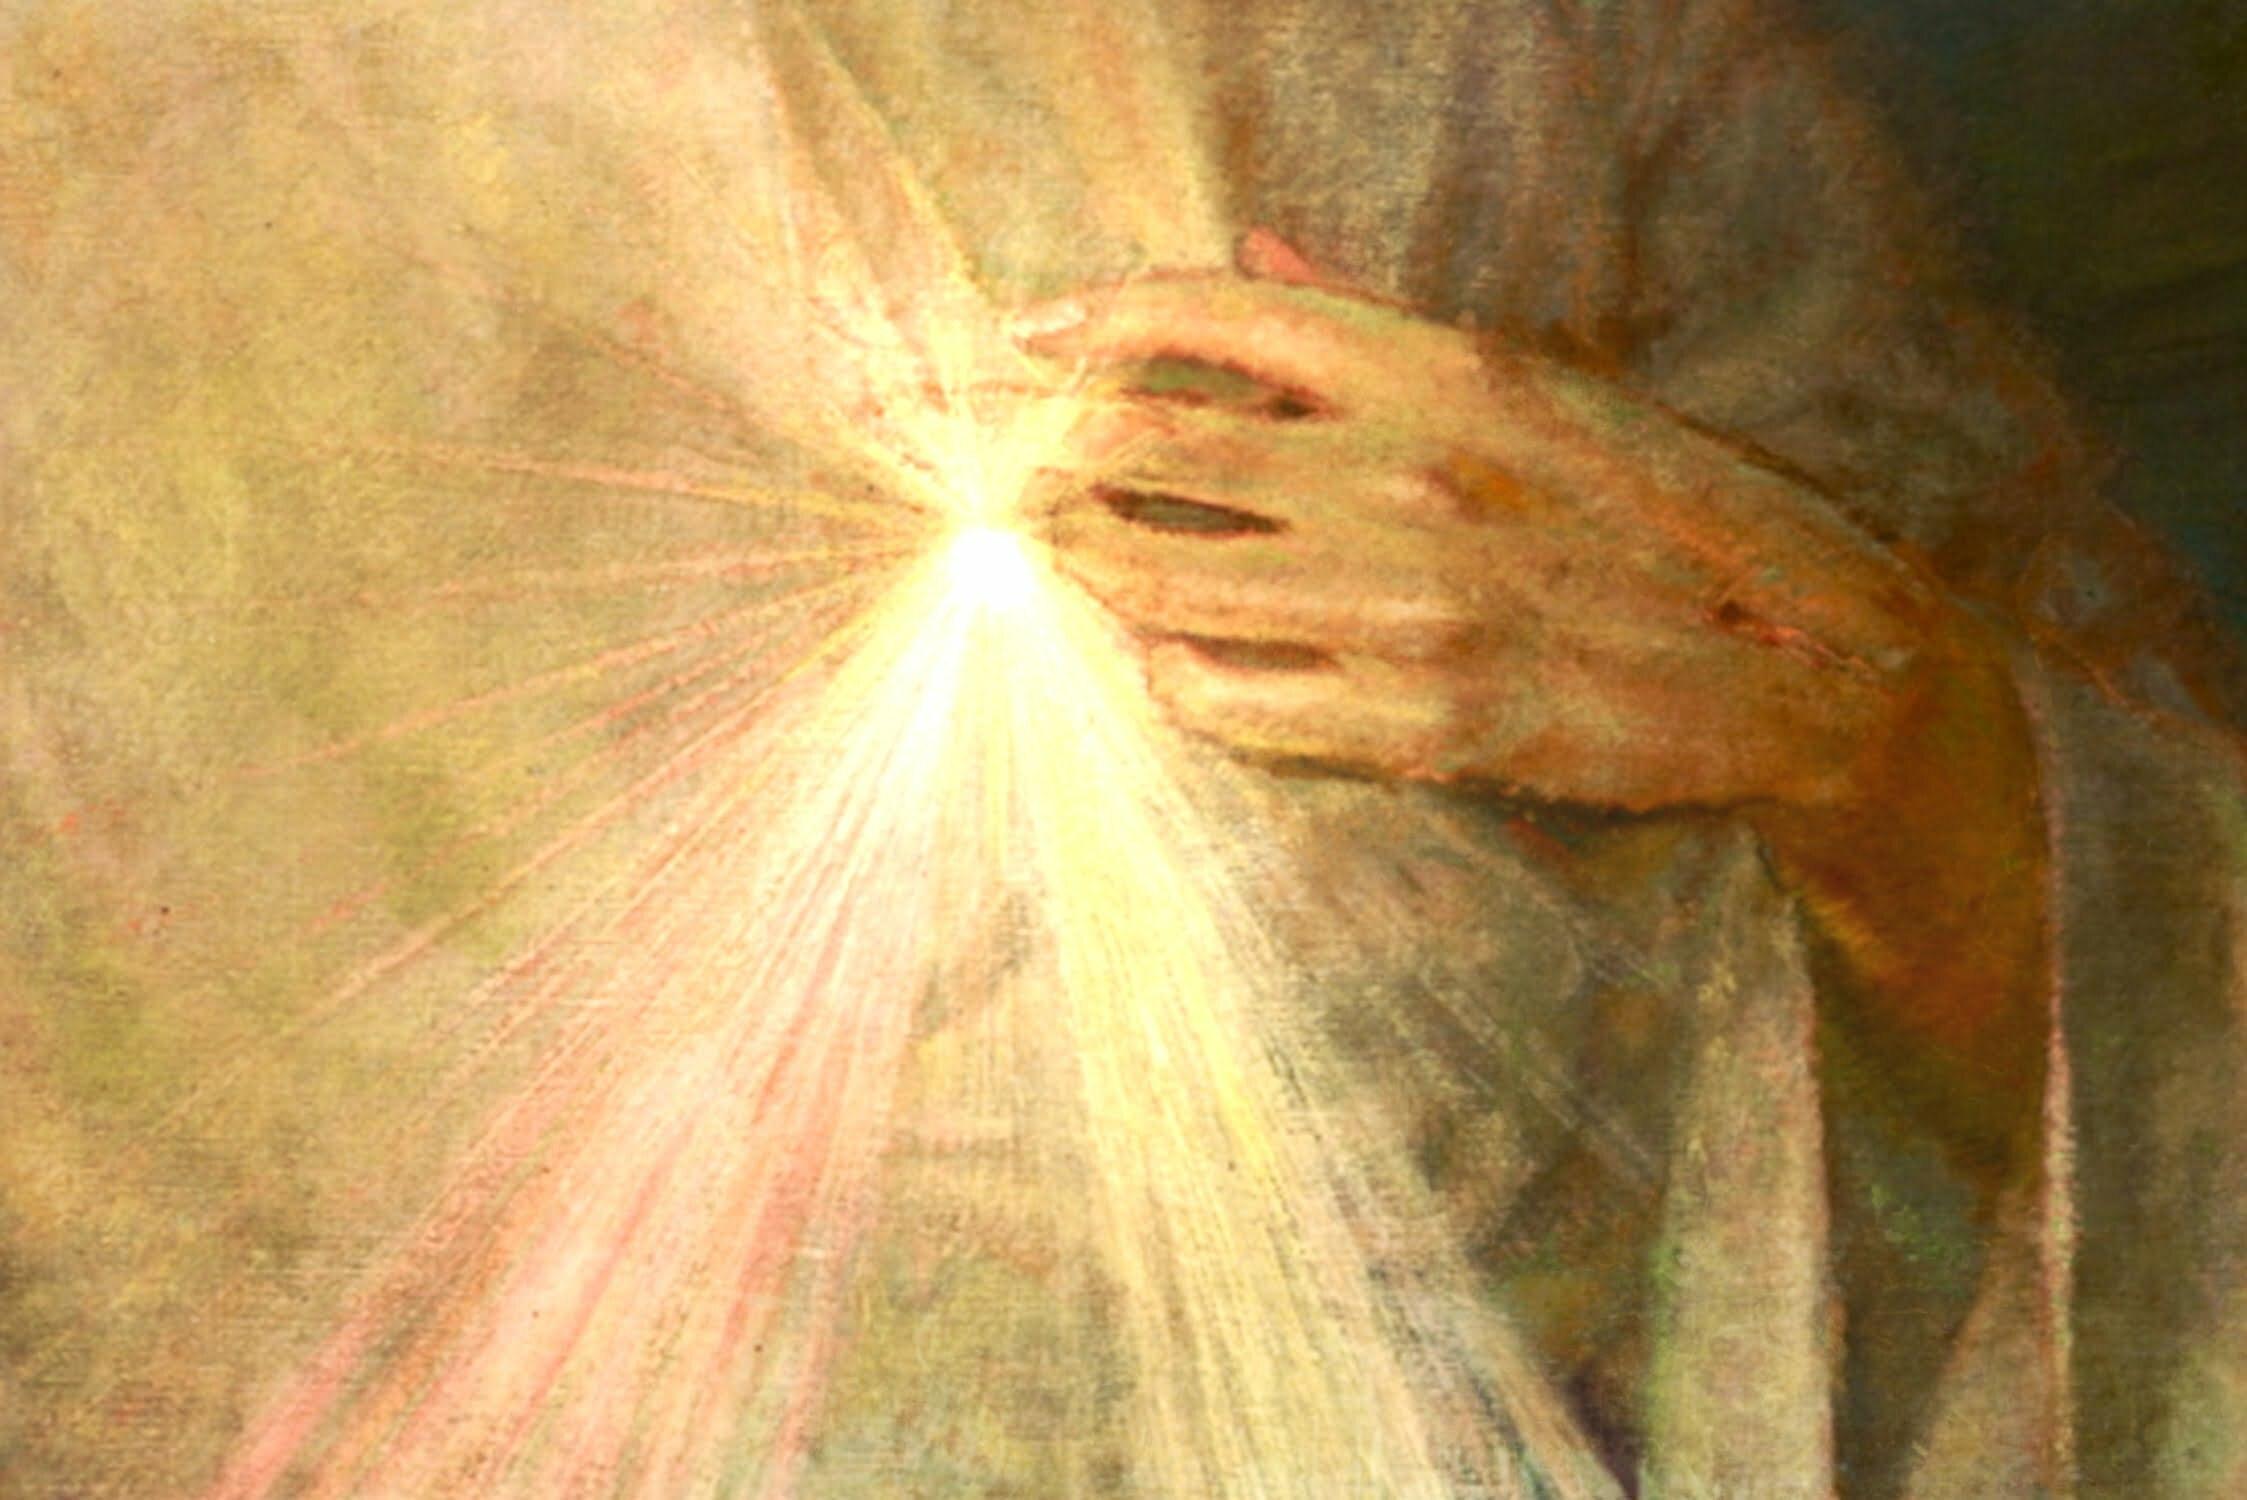 božie milosrdenstvo